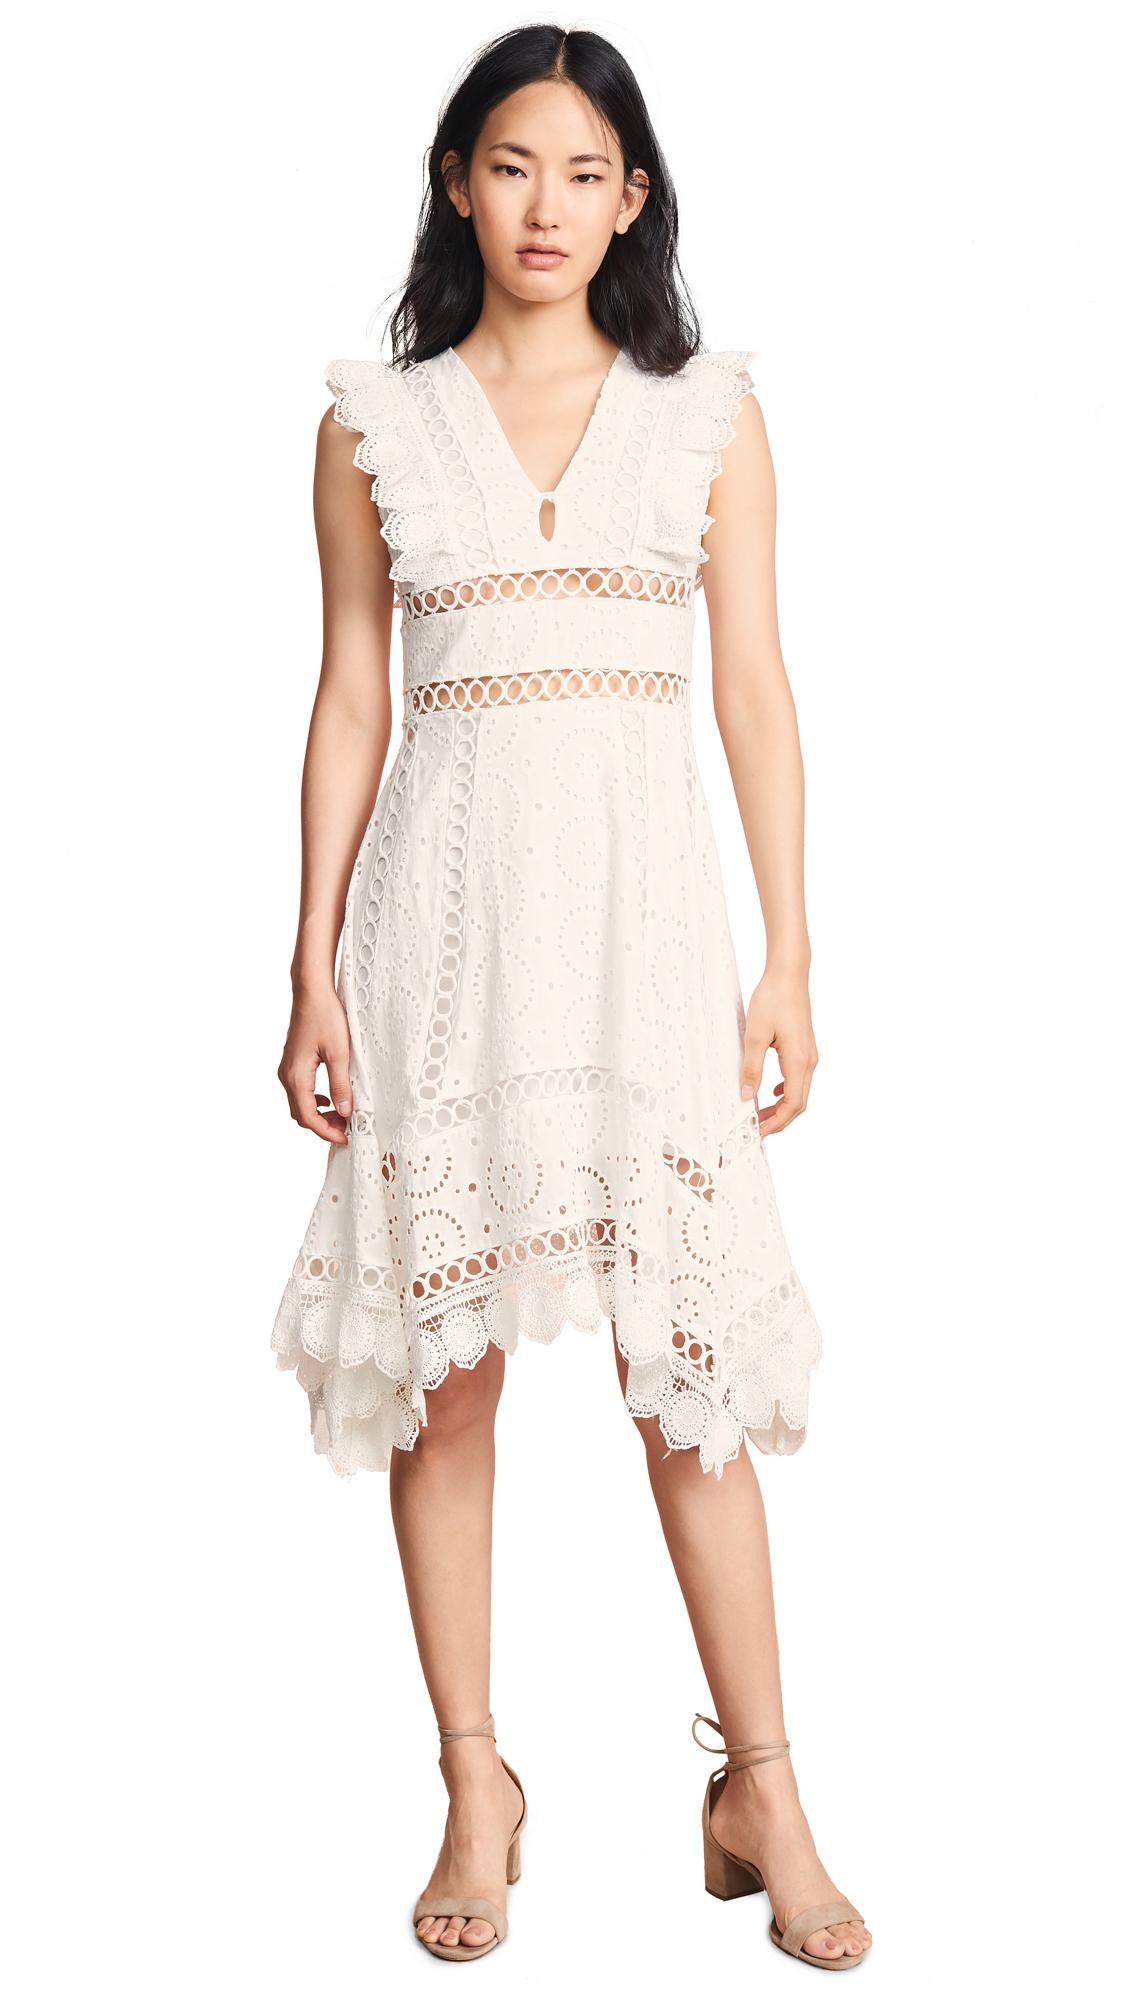 STYLEKEEPERS Euphoria Dress In Ivory